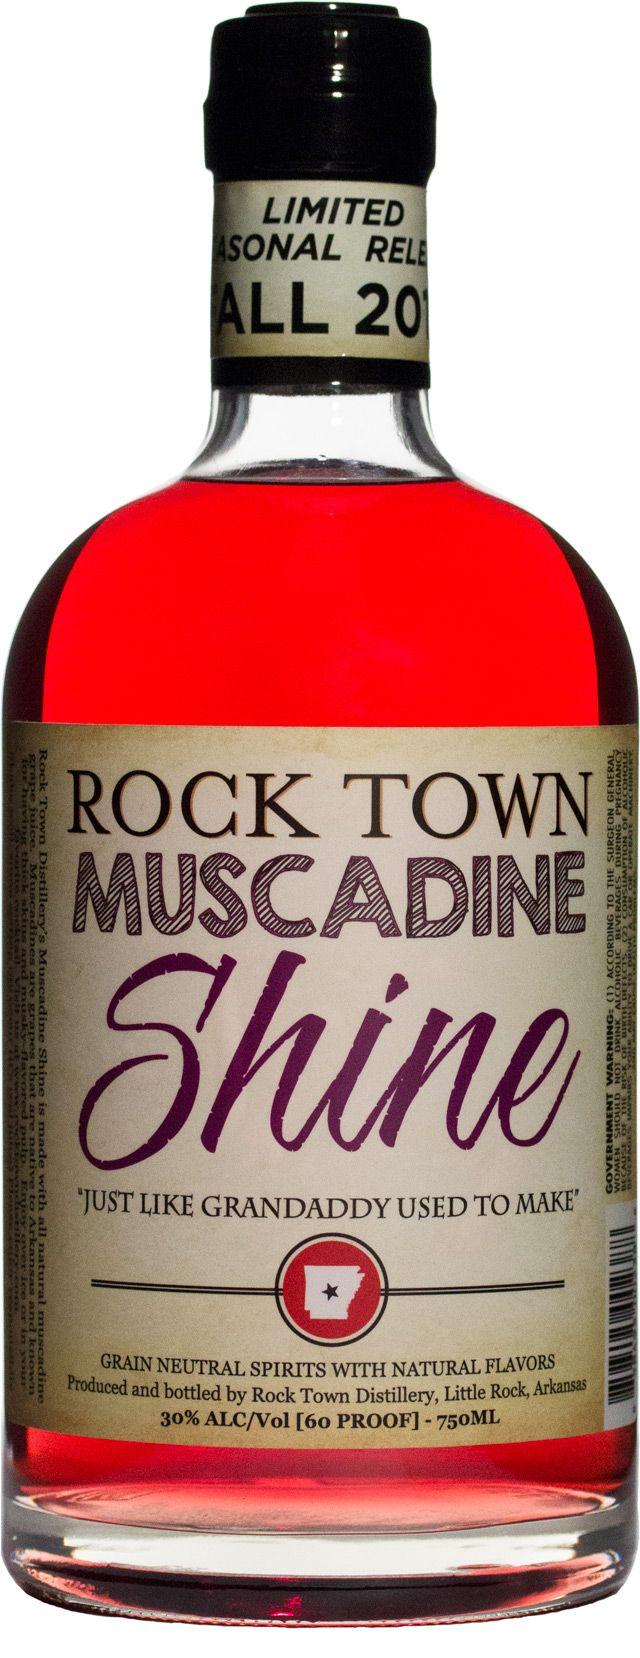 Our New Seasonal Release Muscadine Shine Whiskey Bottle Bottle